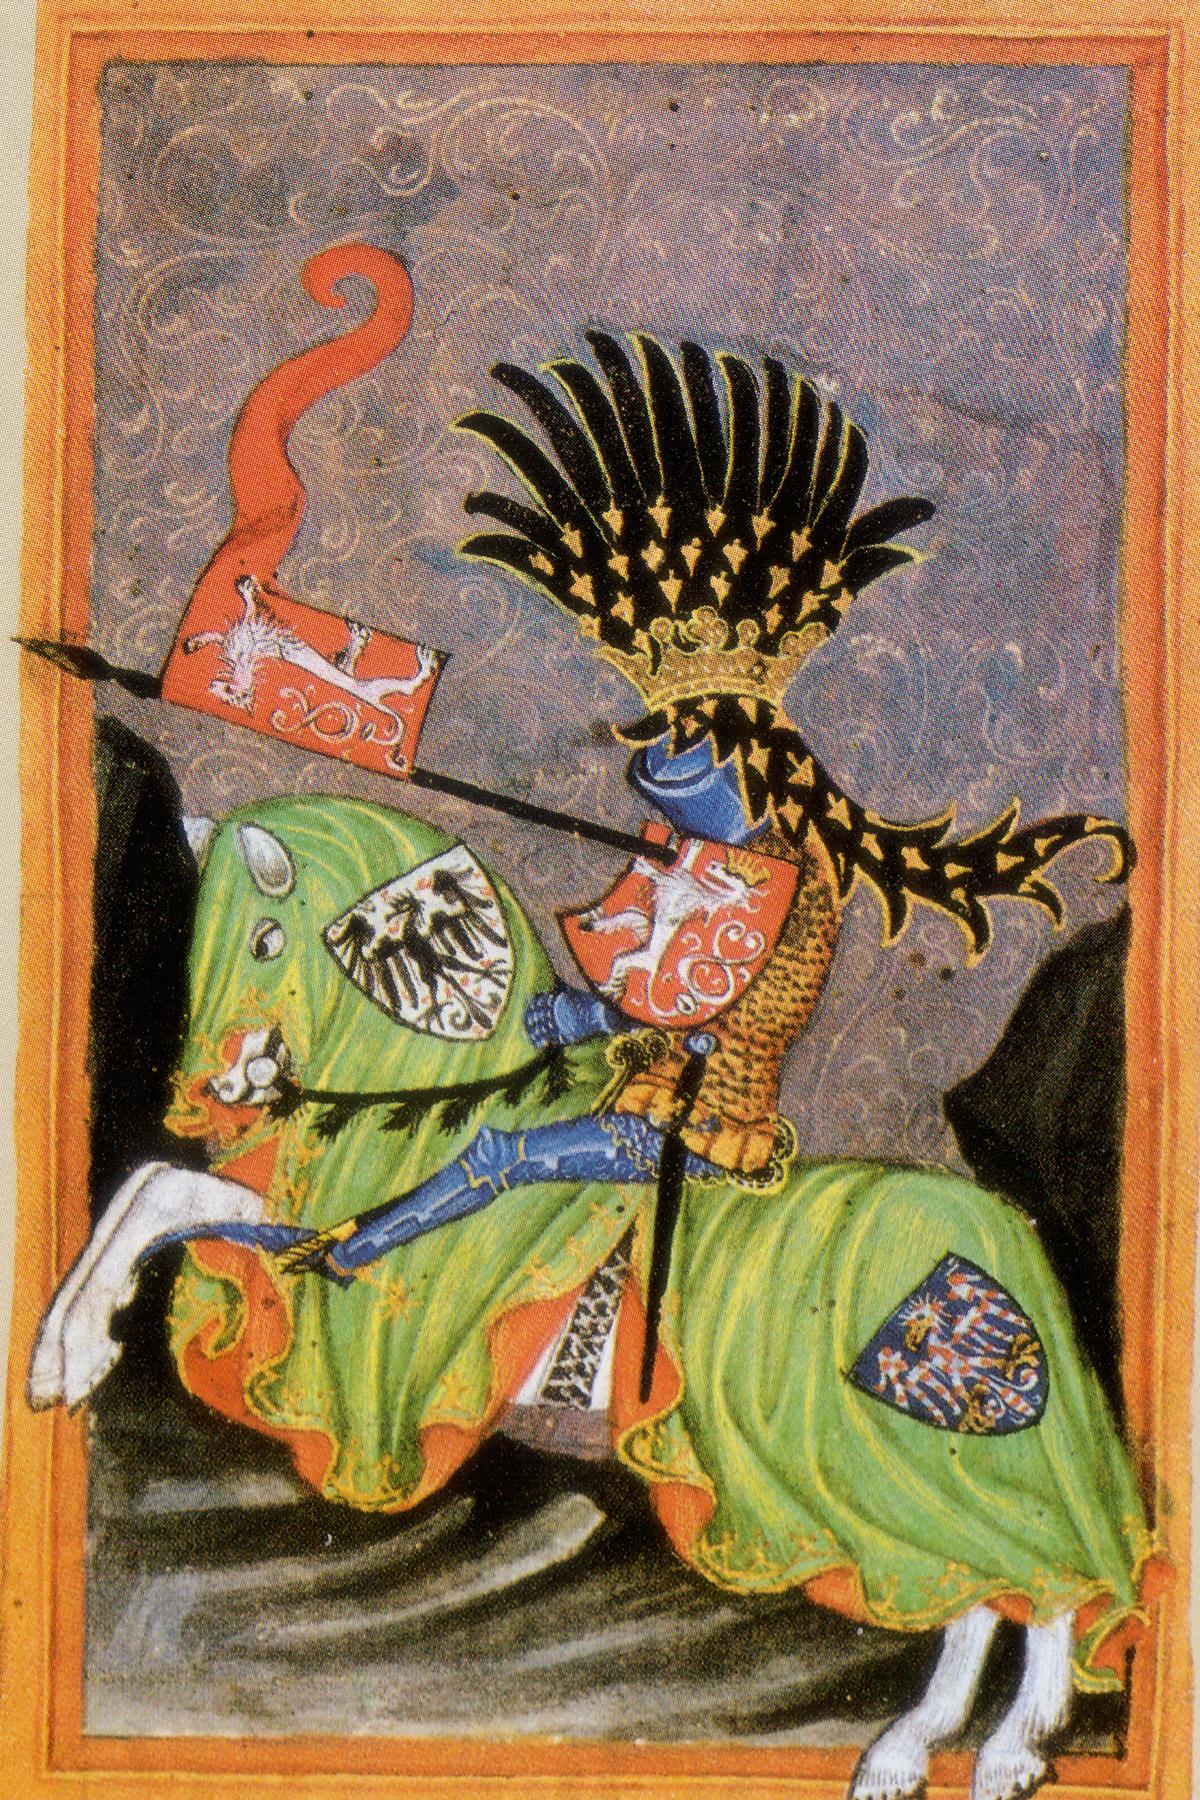 Wenceslaus I of Bohemia, early 15th century, Iglau, Bohemia, now Jihlava, Czech Republic